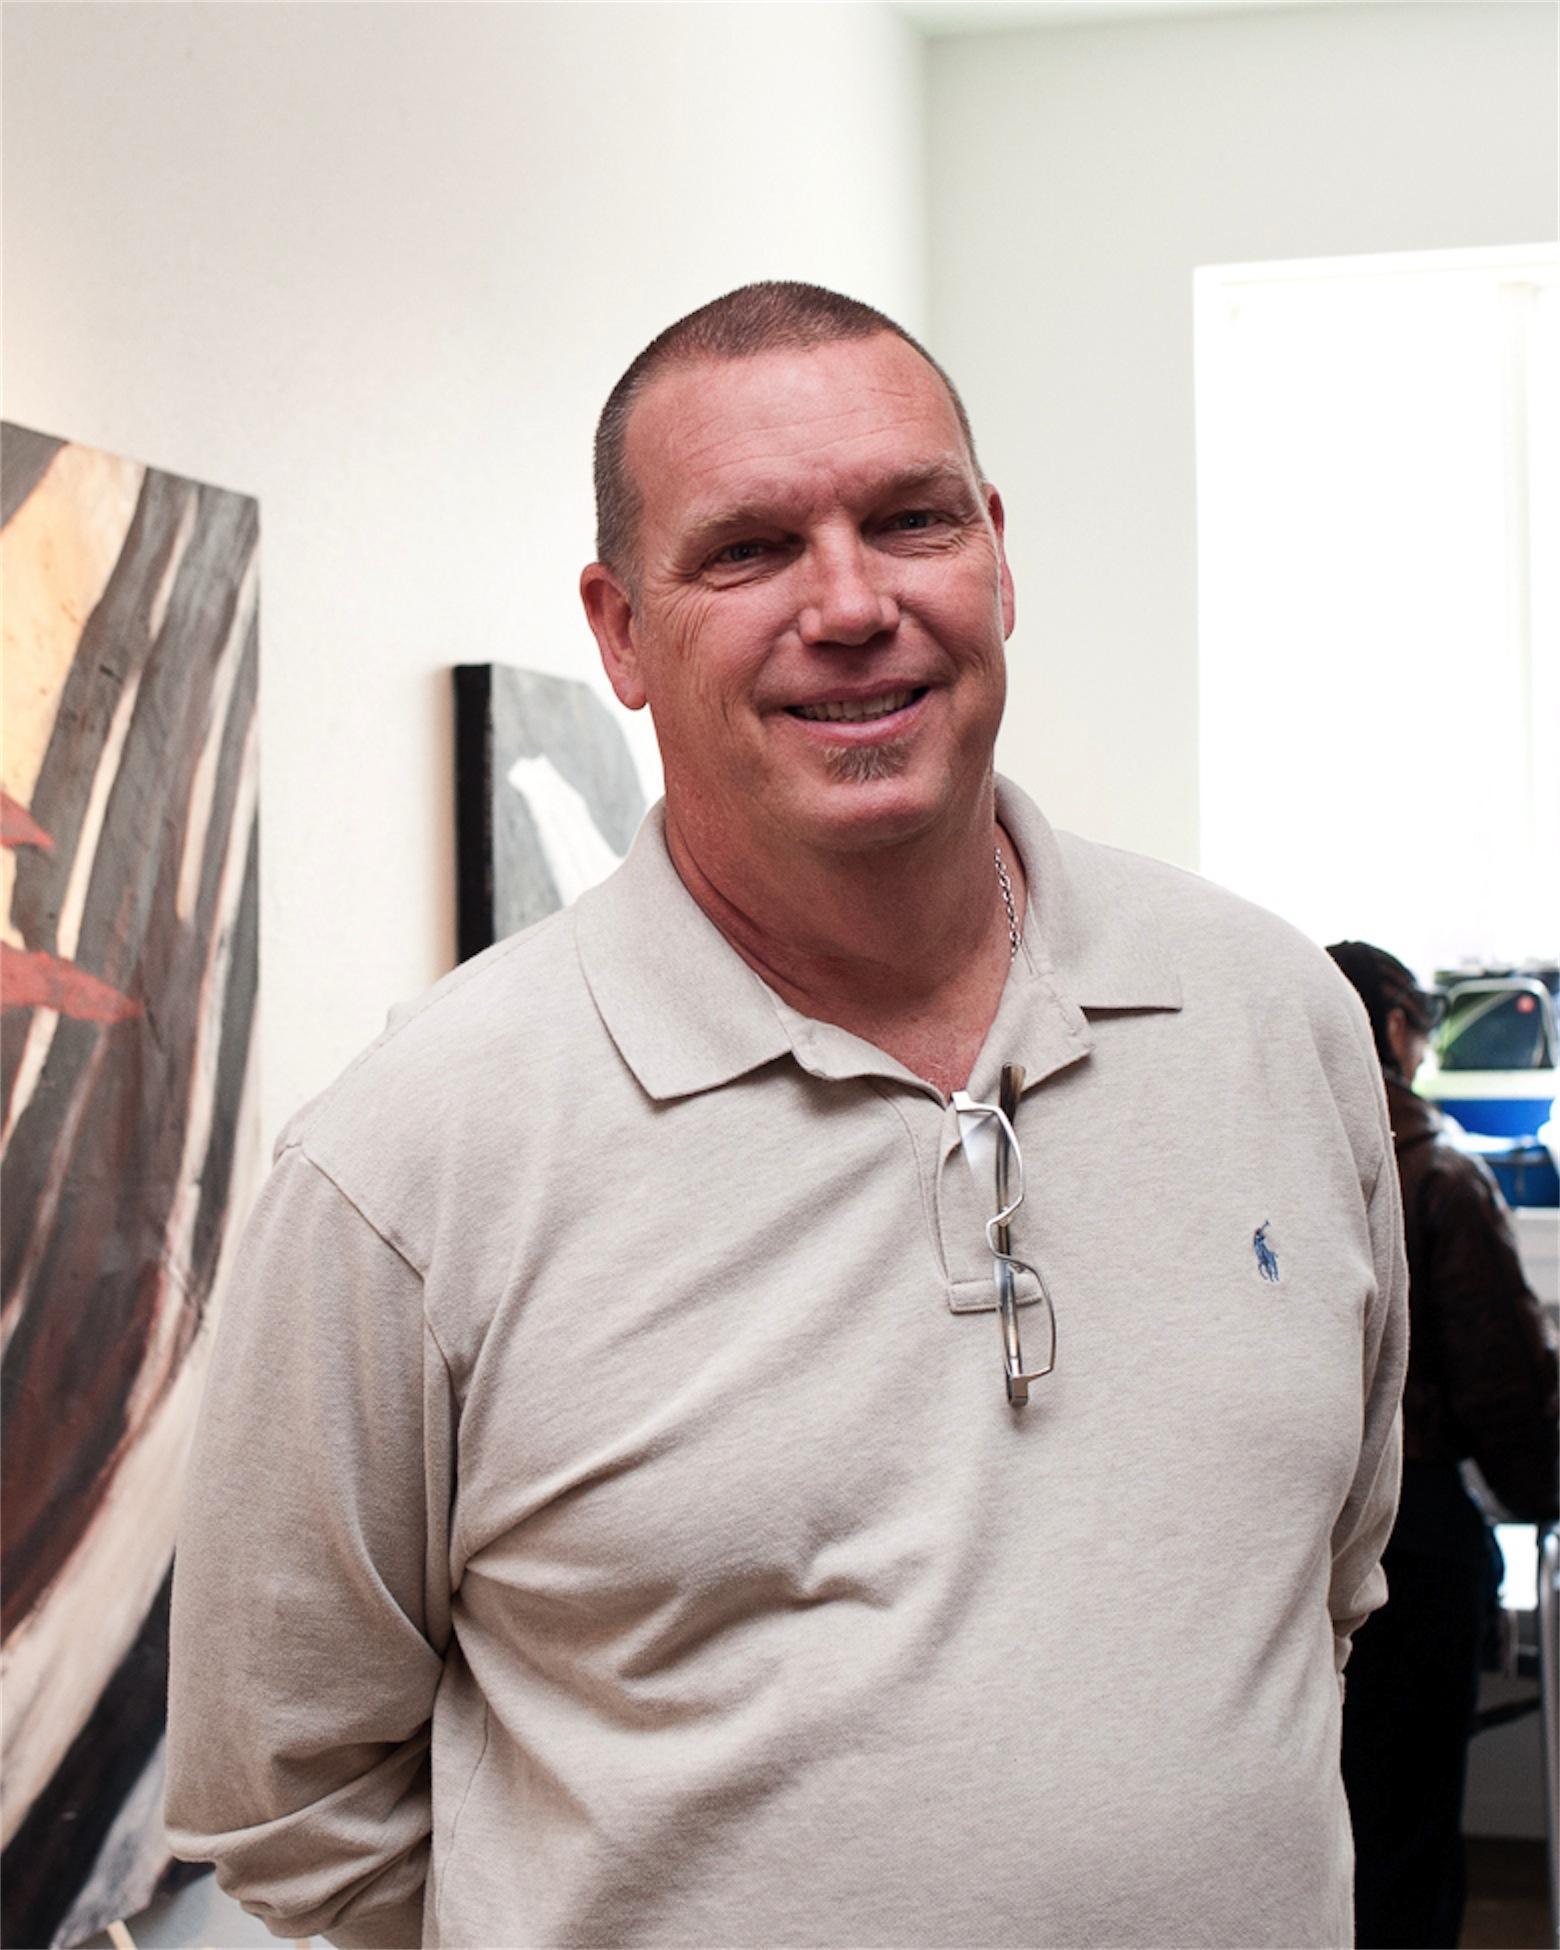 Damon McLeese - 2011